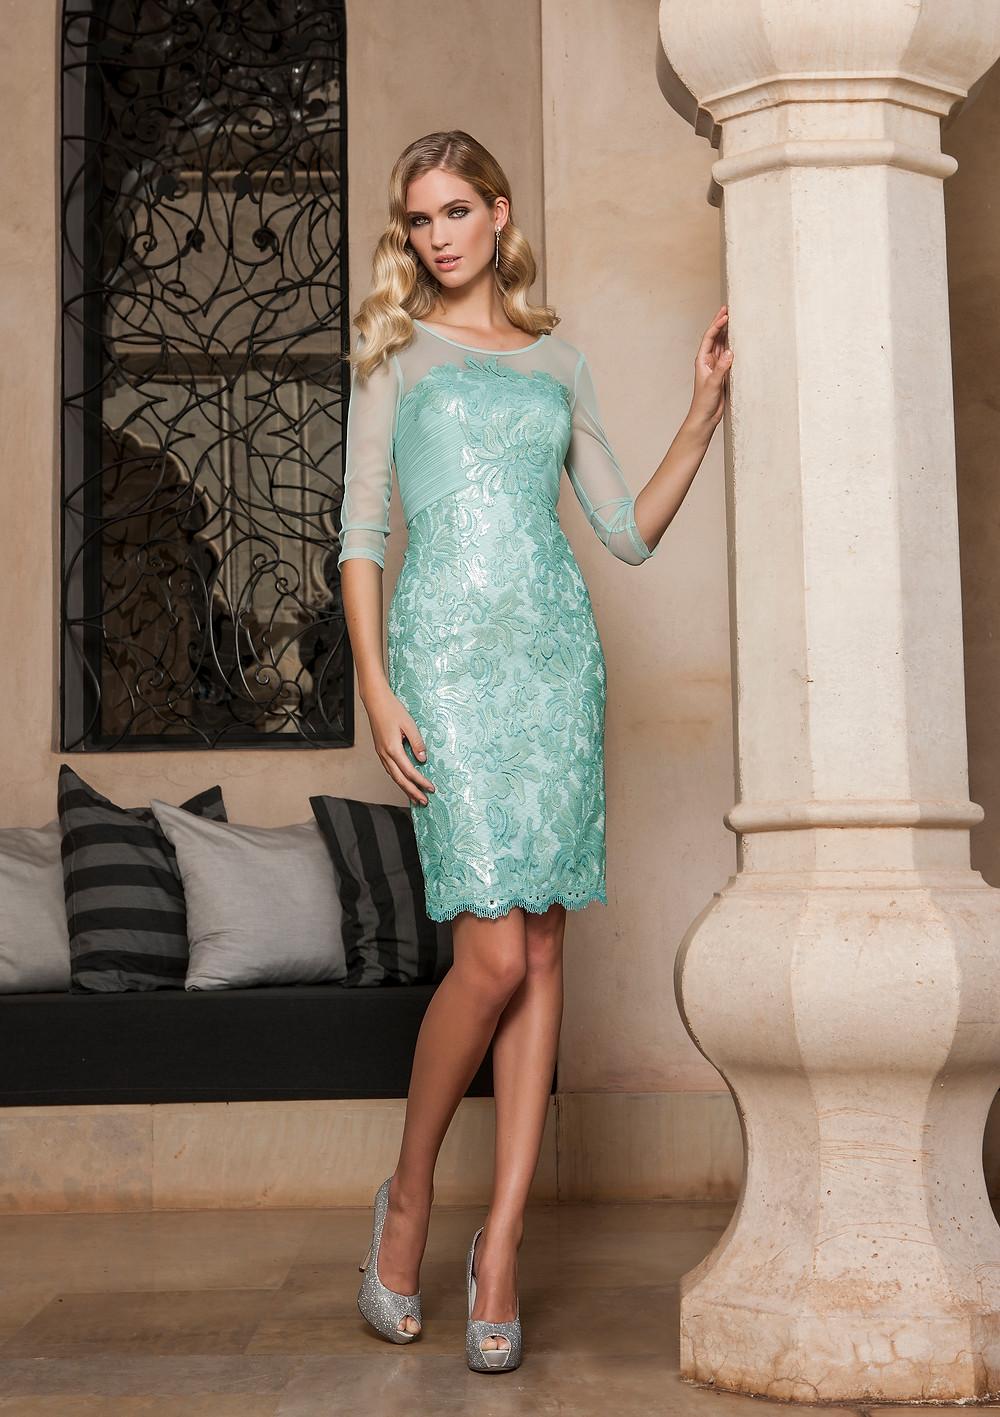 Sonia Pena dress 2015 from L Occasionwear Ayr